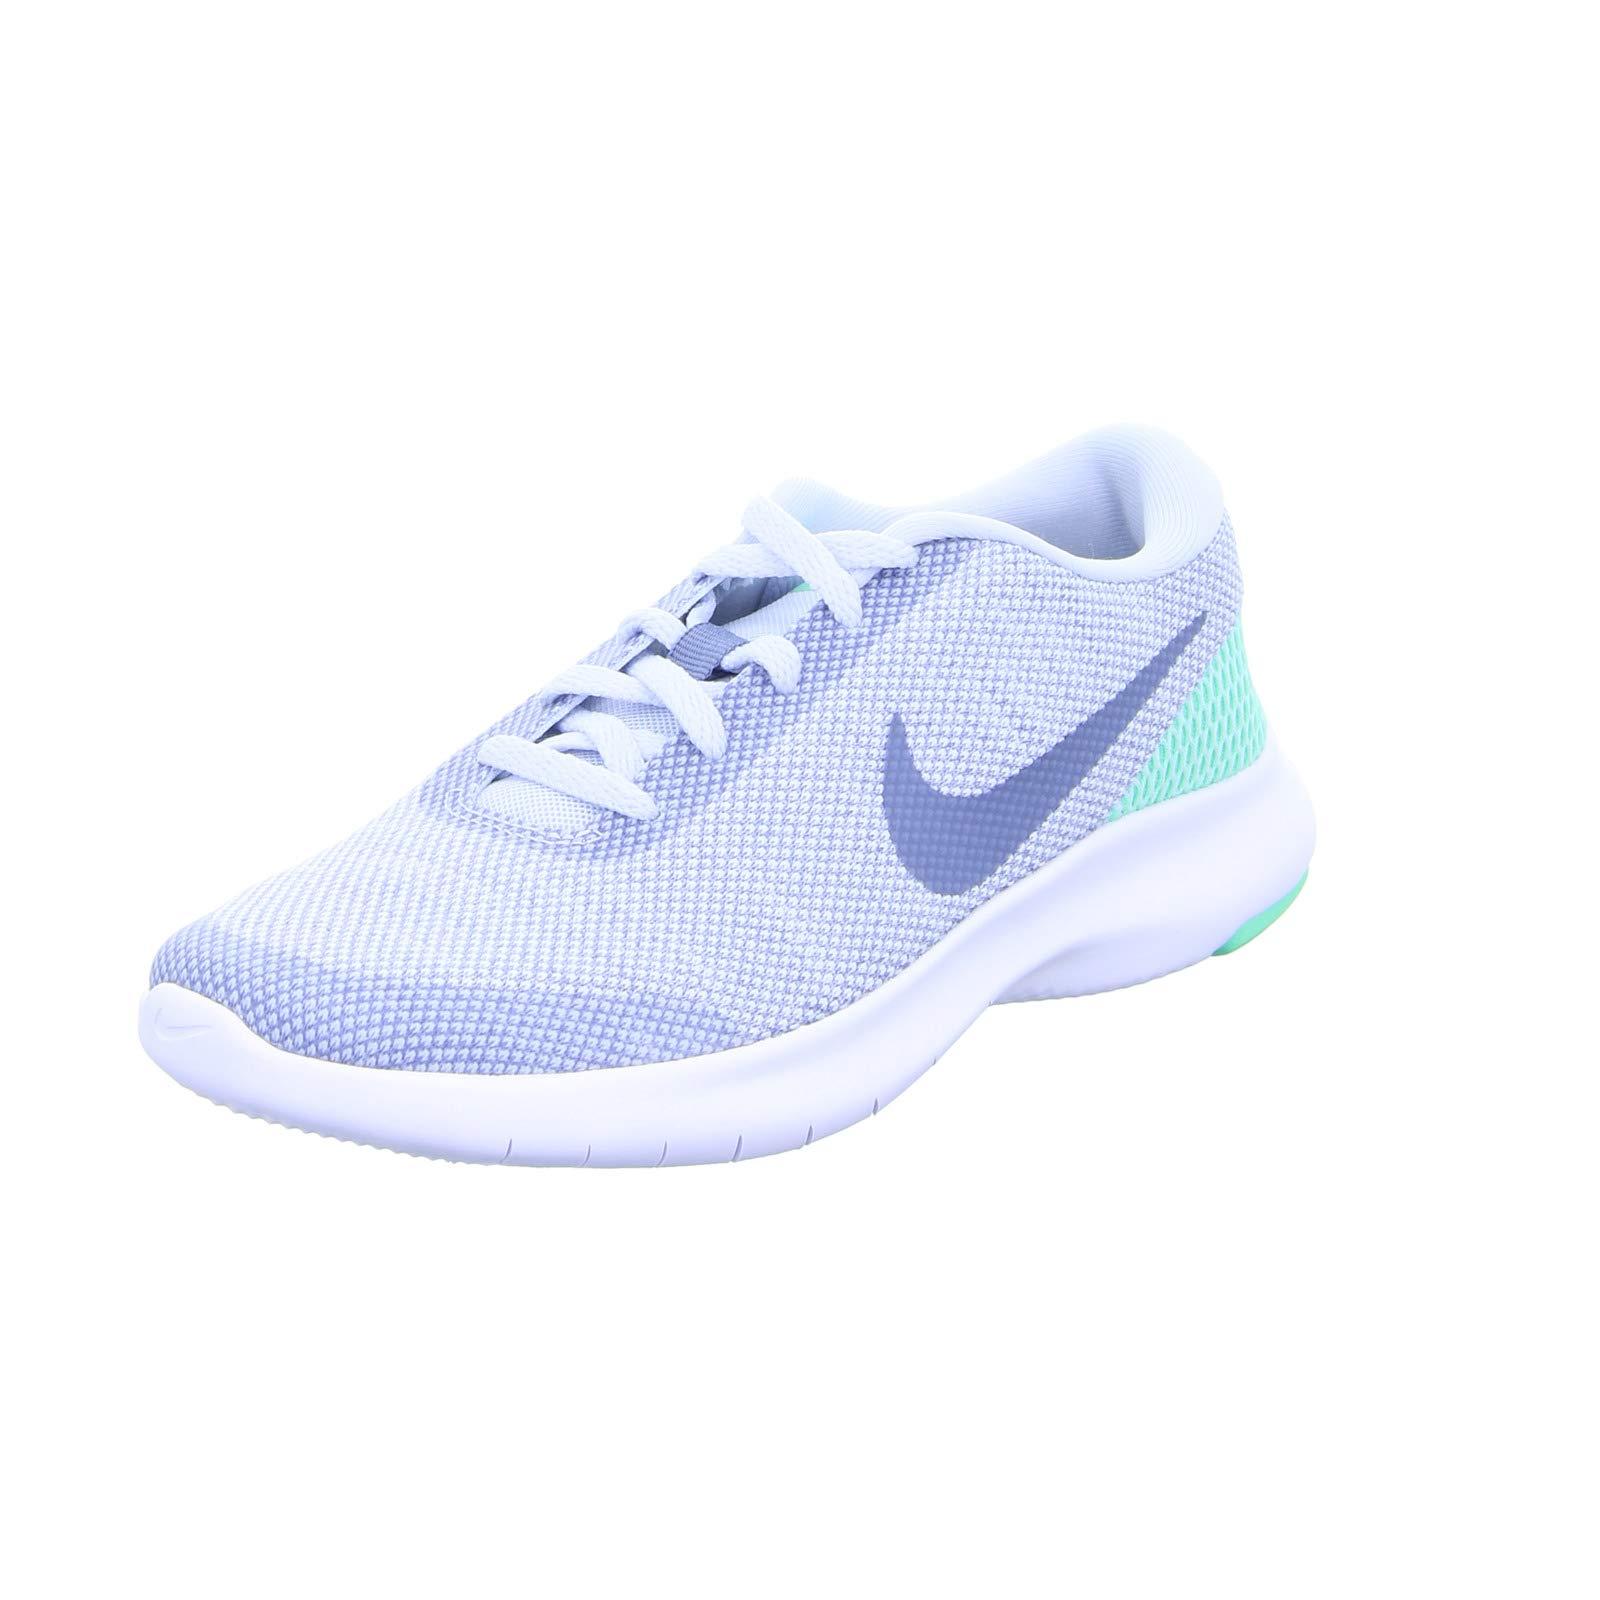 aa1267fd88c5 Galleon - Nike Women s Flex Experience RN 7 Running Shoe Football  Grey Ashen Slate Green Glow Size 8 M US